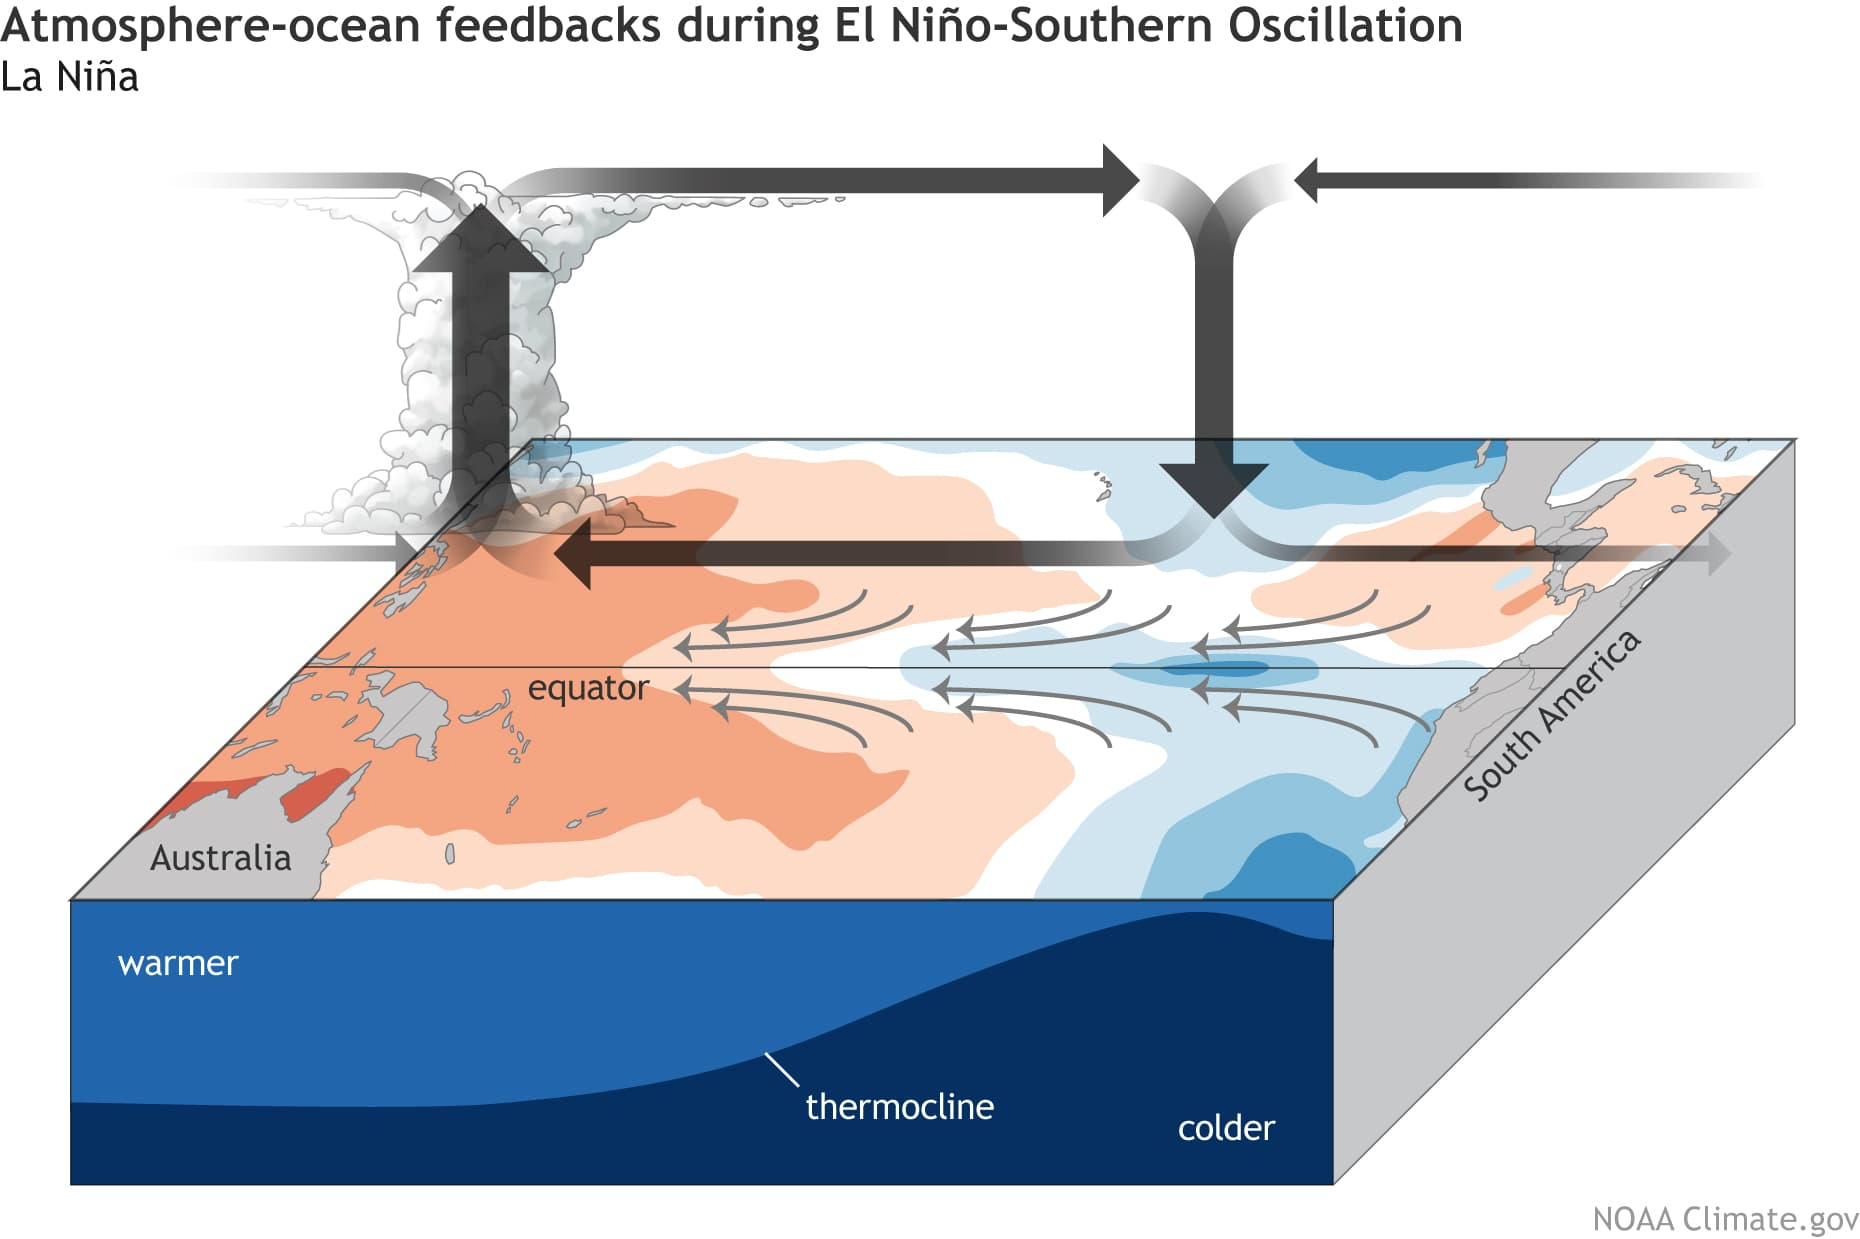 winter-season-weather-forecast-united-states-europe-enso-circulation-pressure-pattern